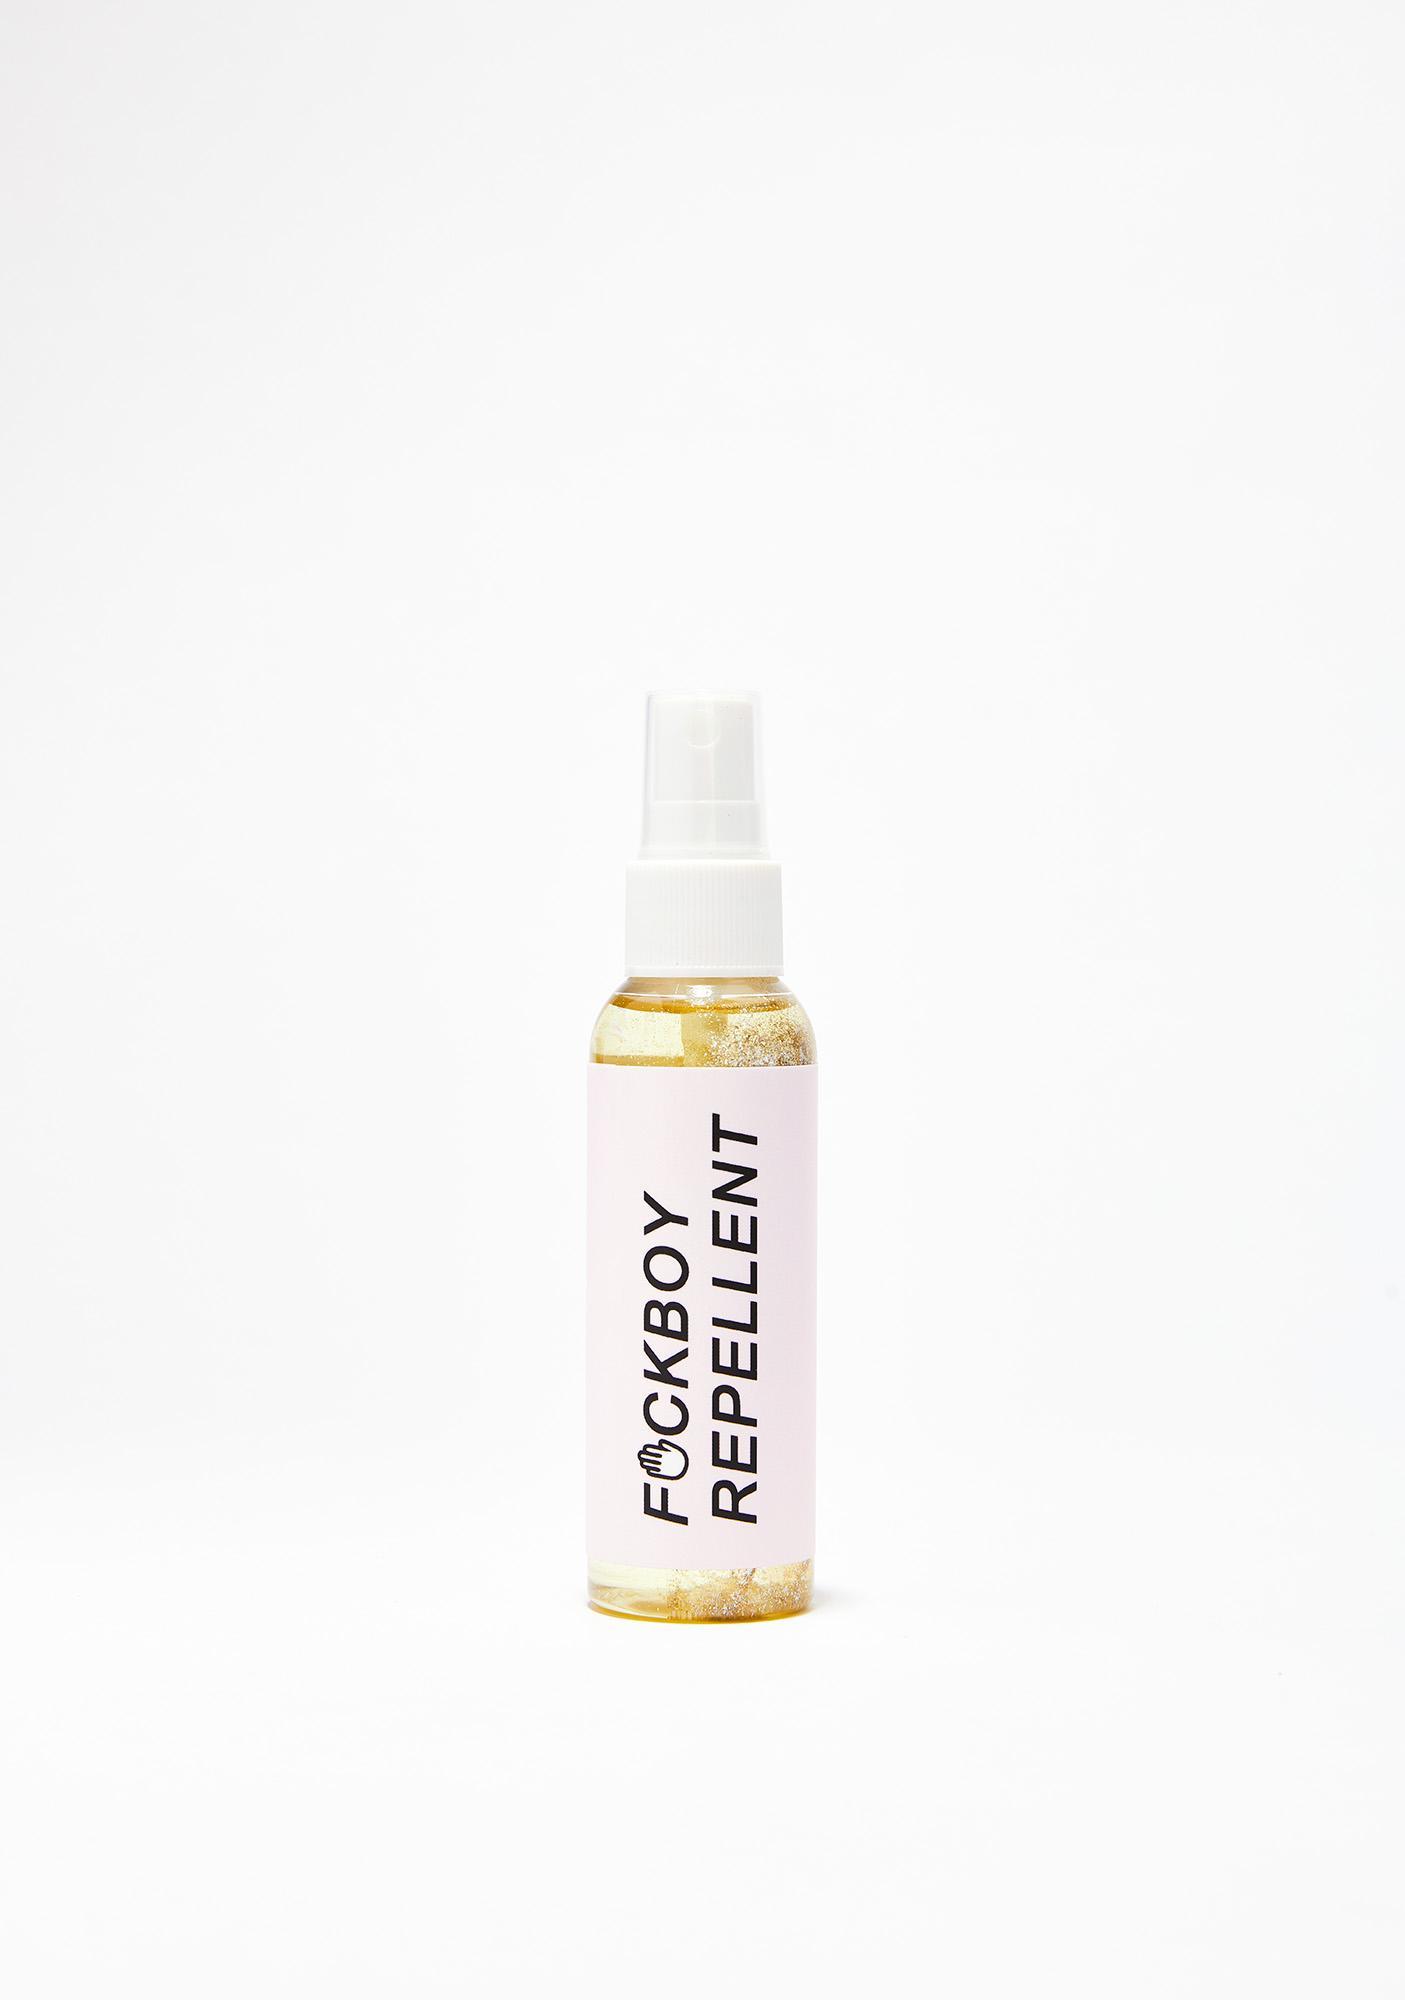 Lovability Inc. Fuckboy Repellent